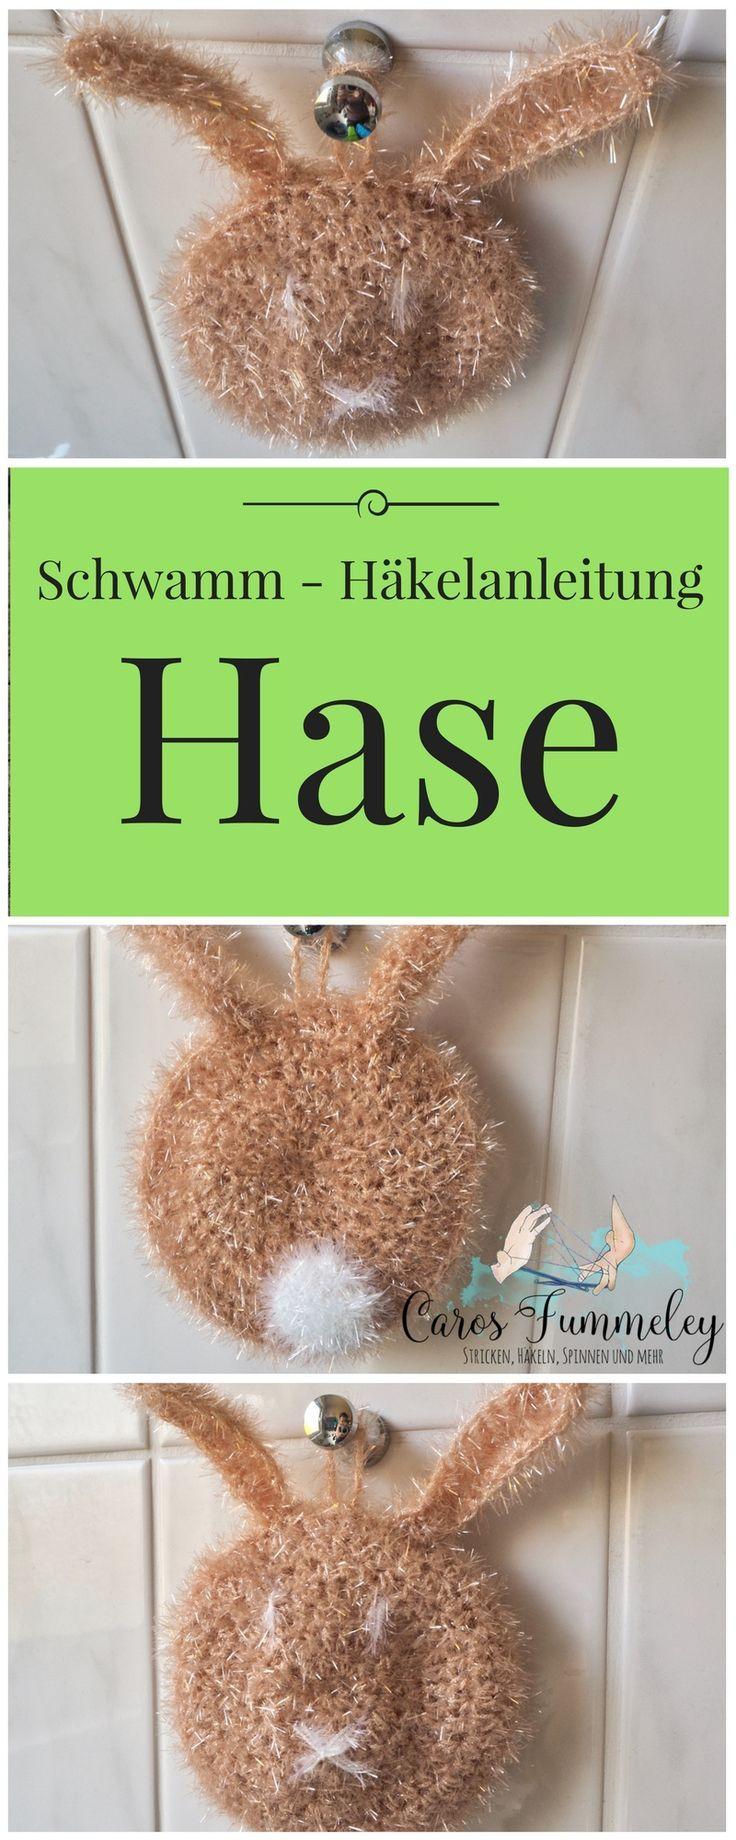 Häkelanleitung Hasen Schwamm Häkeln Amigurumi Pinterest